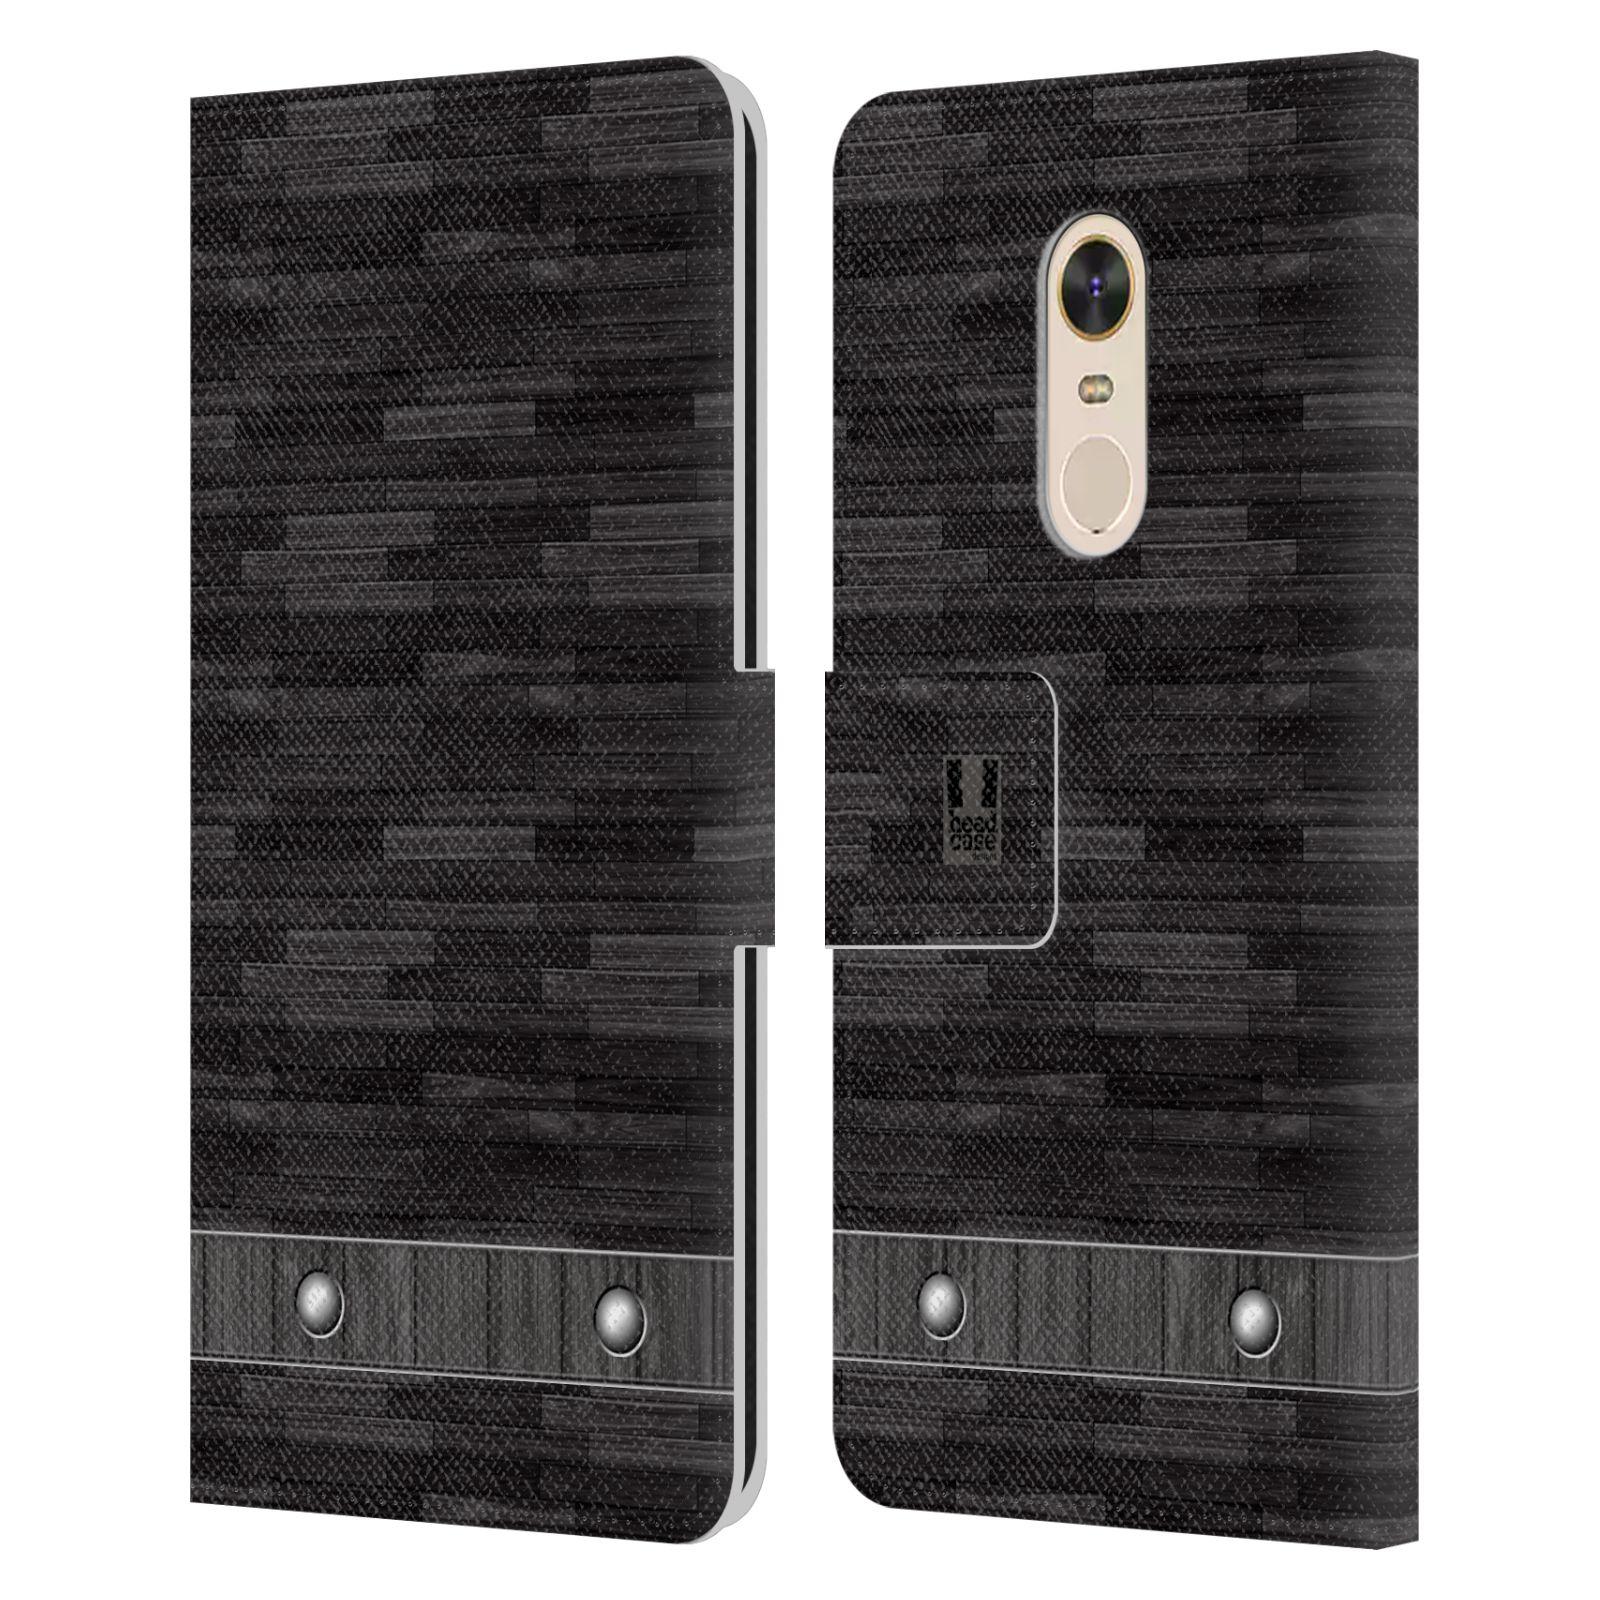 HEAD CASE Flipové pouzdro pro mobil Xiaomi Redmi Note 5 stavební textury dřevo černá barva